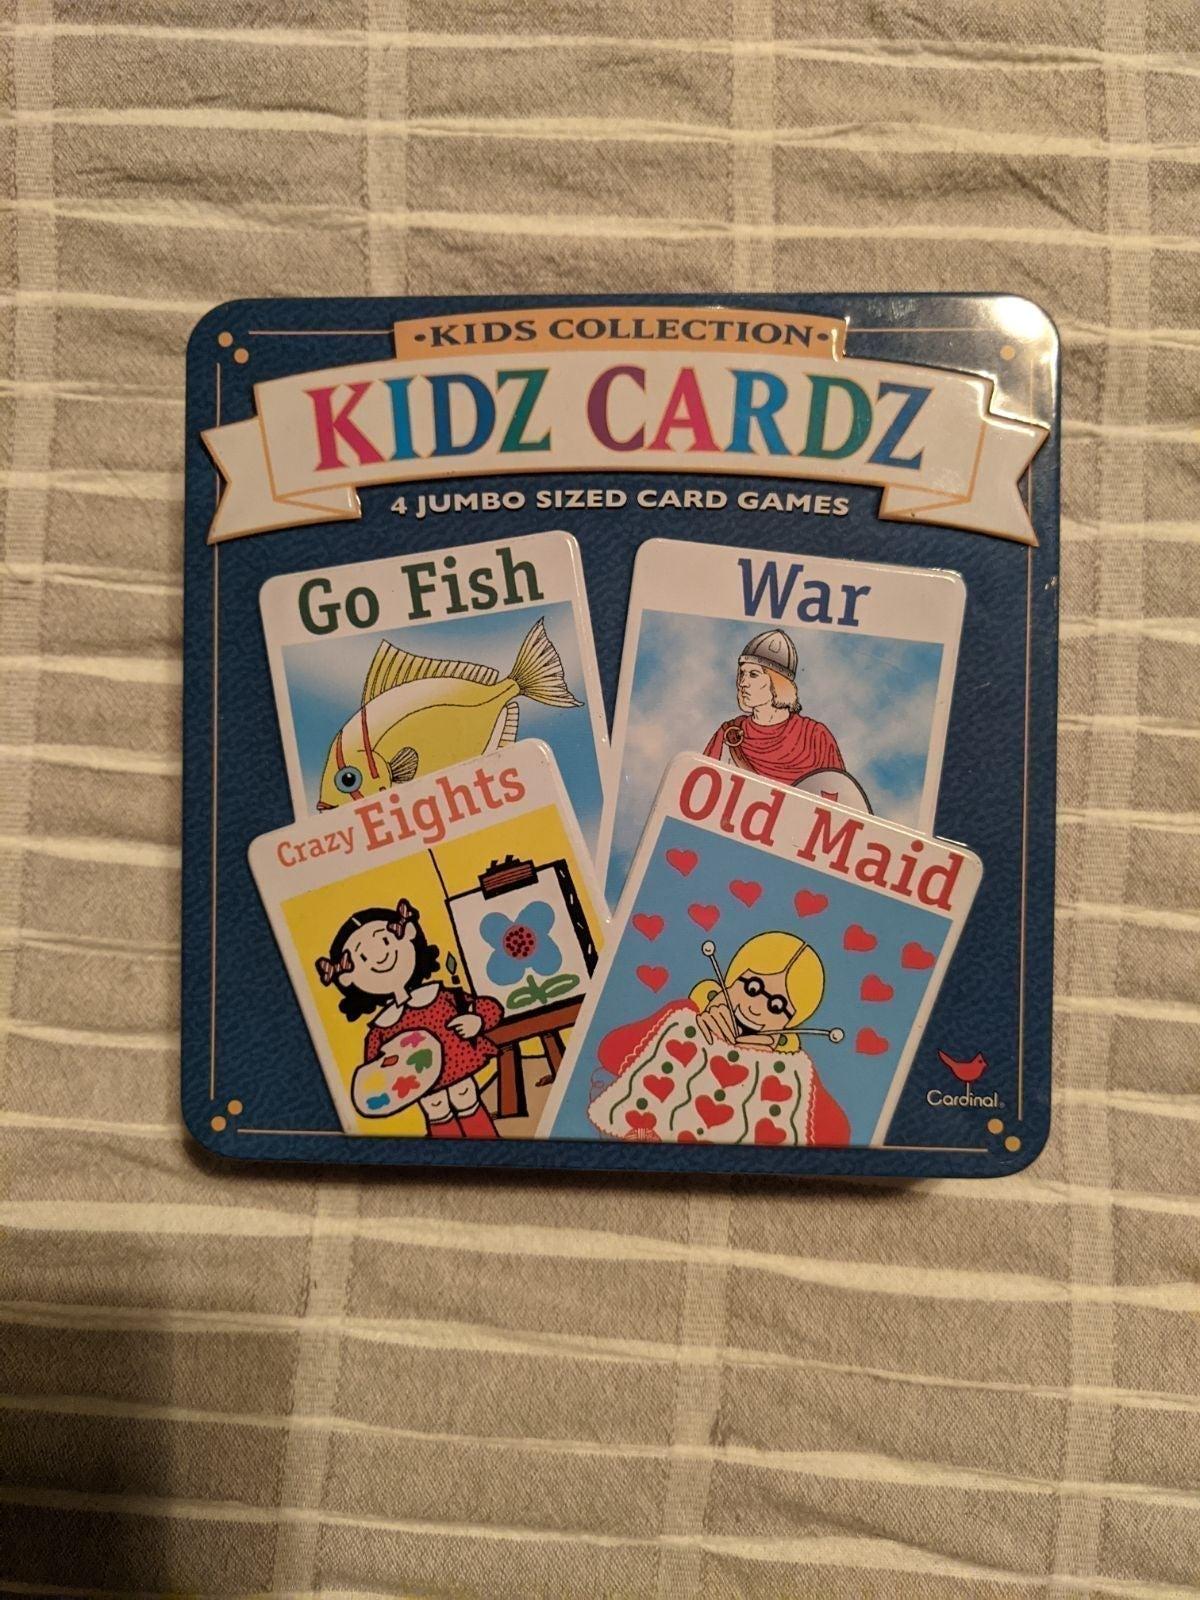 Kidz Cards - 4 card games